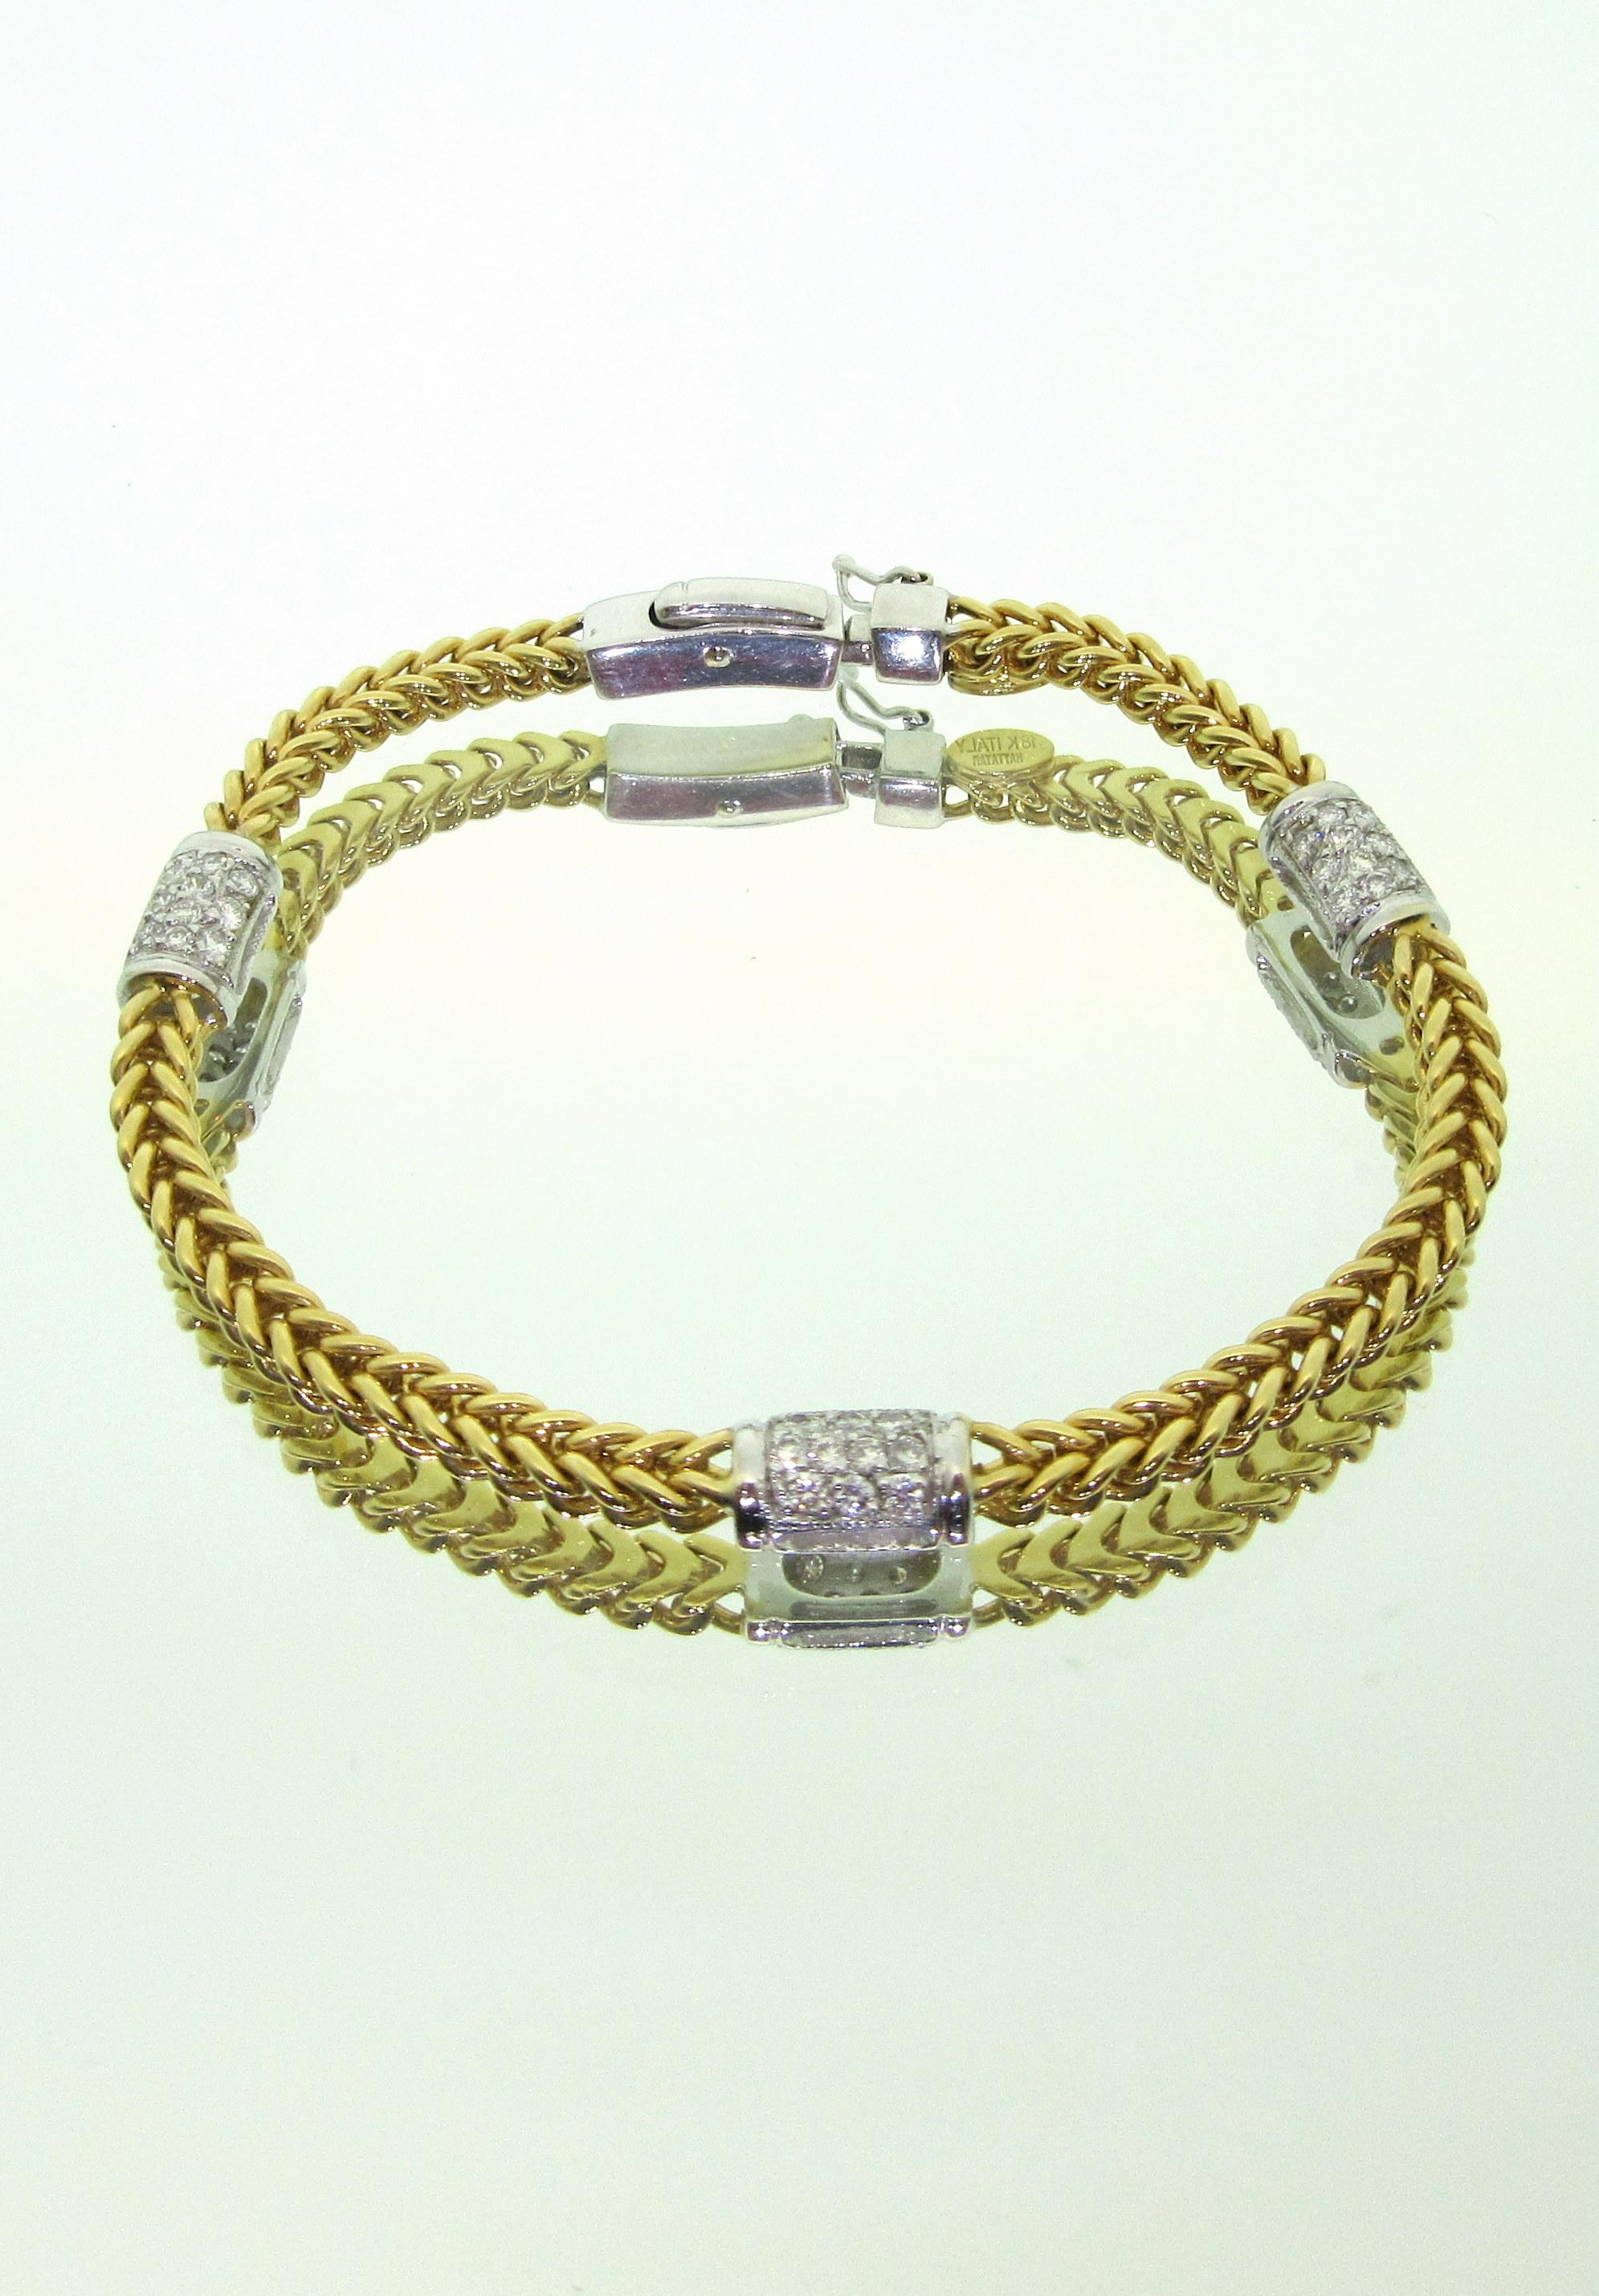 Two-Tone Tennis Bracelet